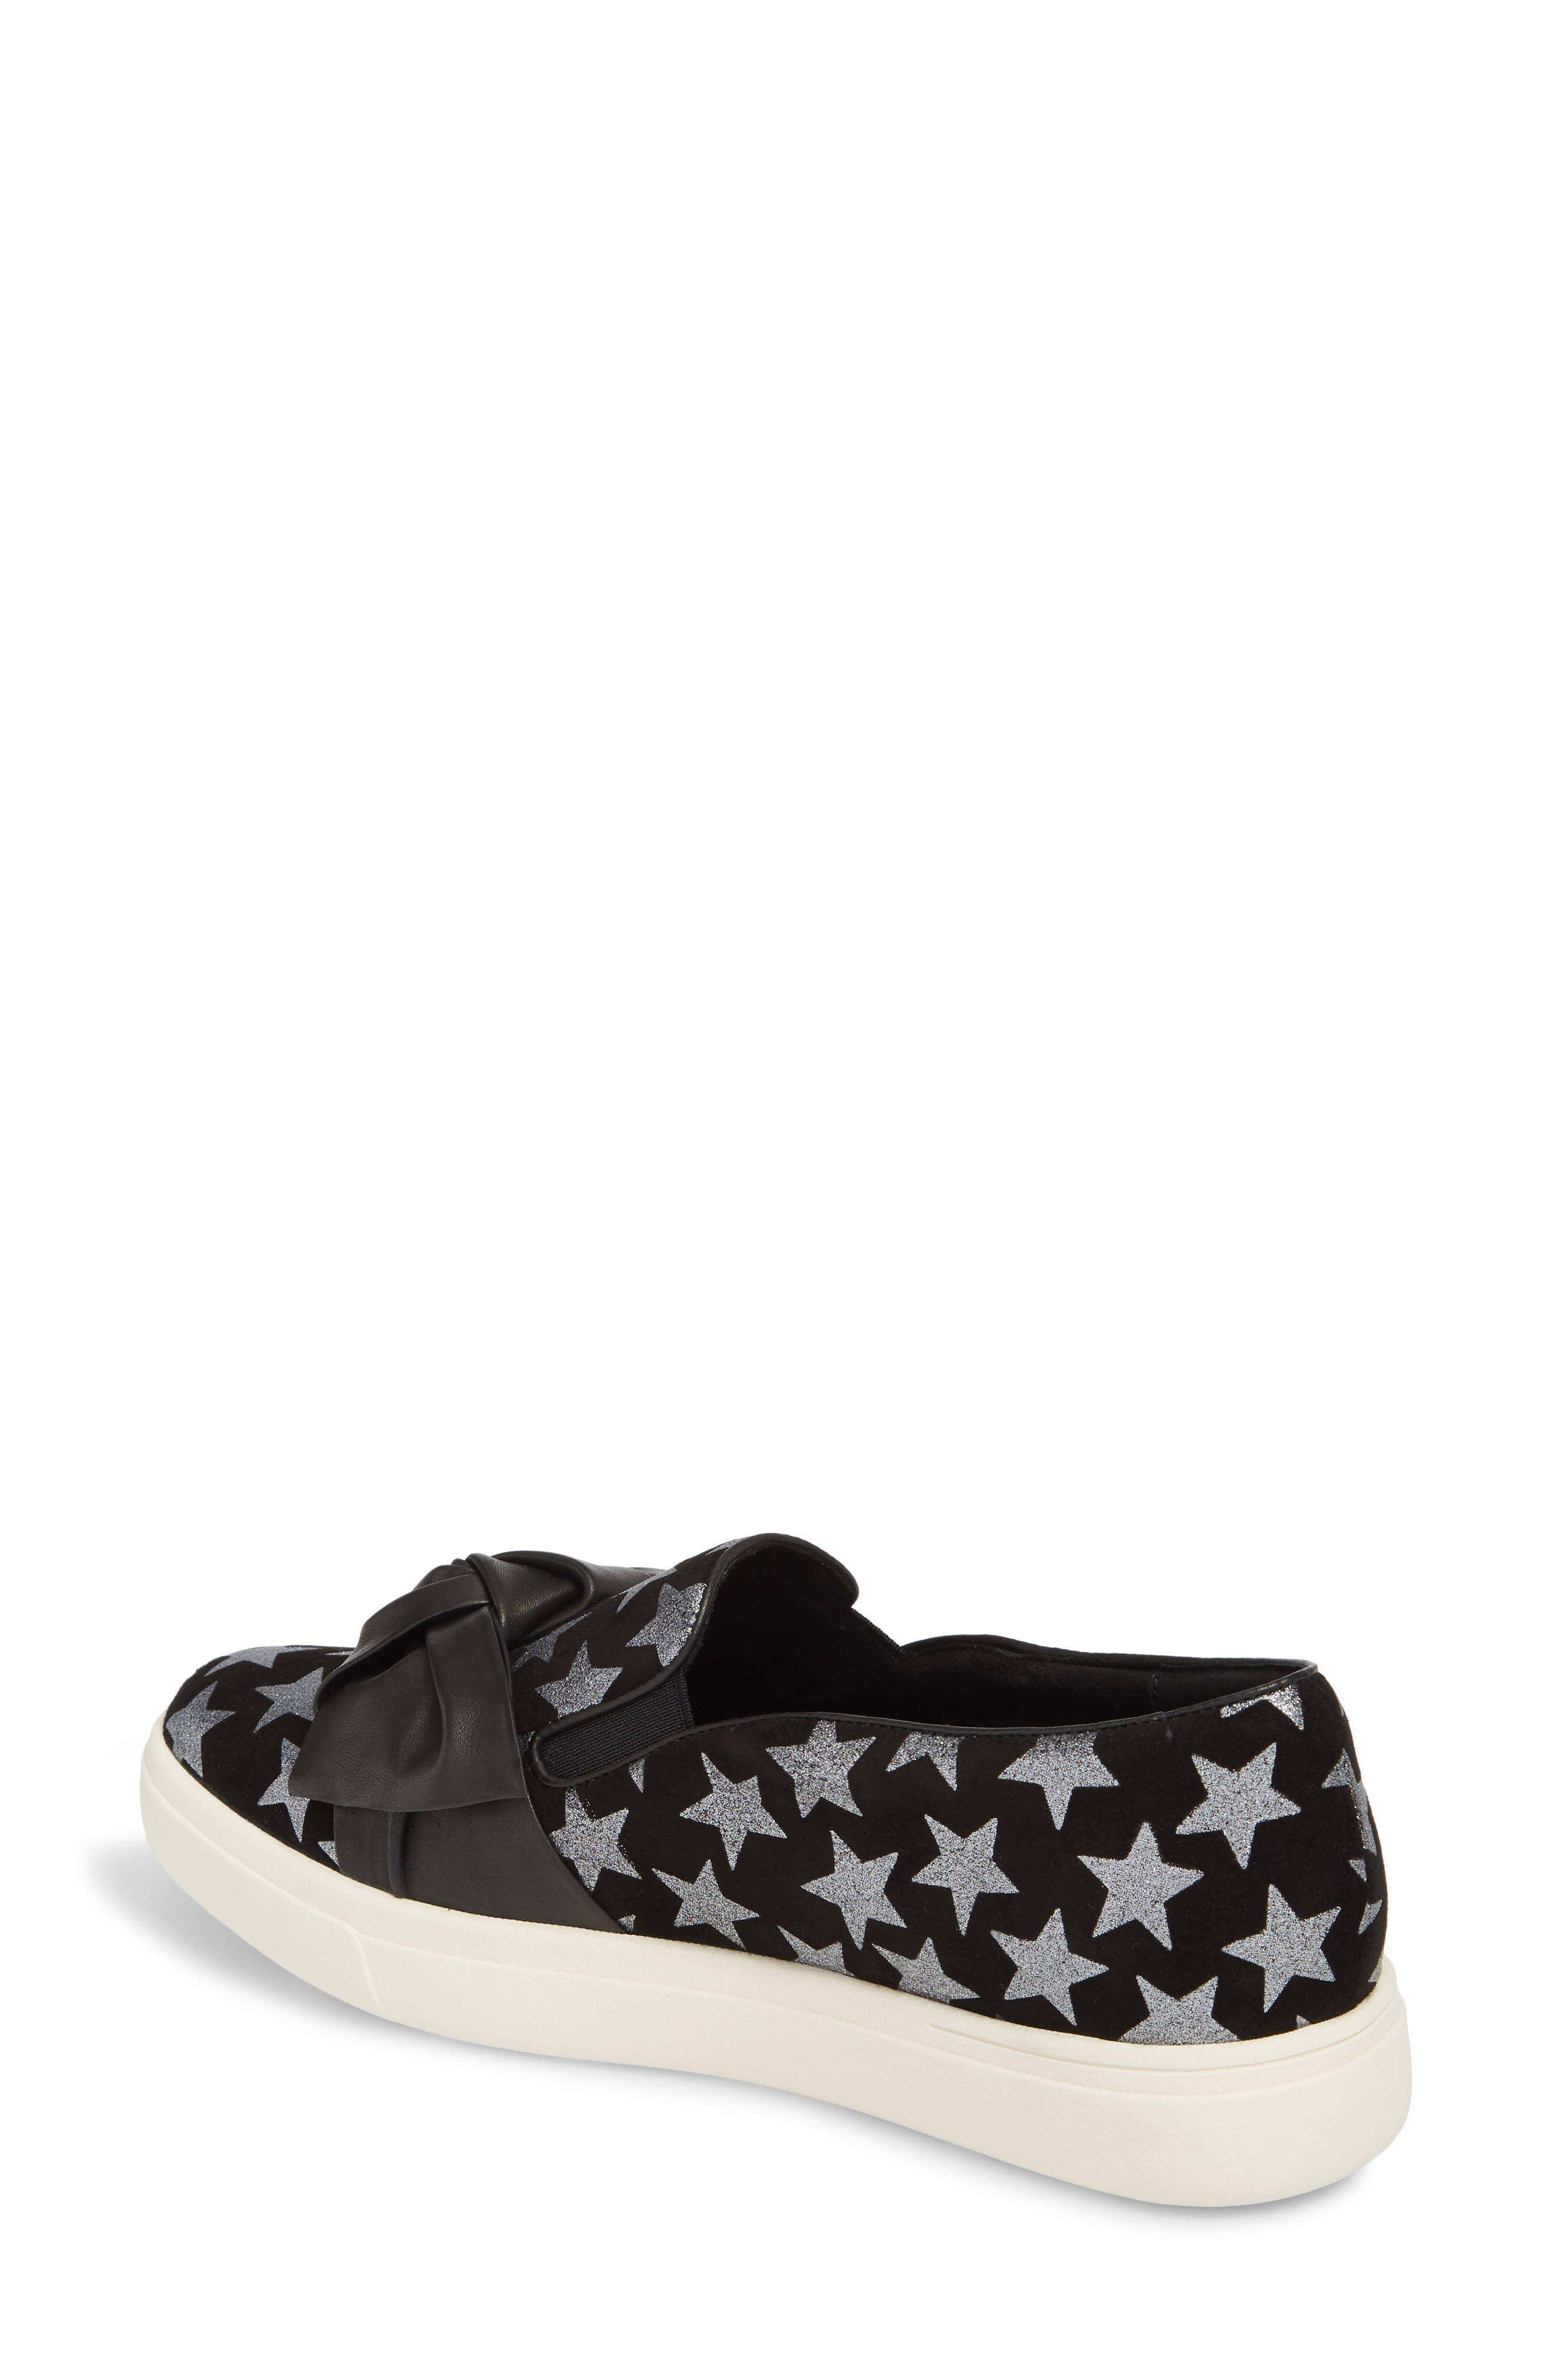 Odelet Slip-On Sneaker,                             Alternate thumbnail 2, color,                             BLACK/ PEWTER SUEDE